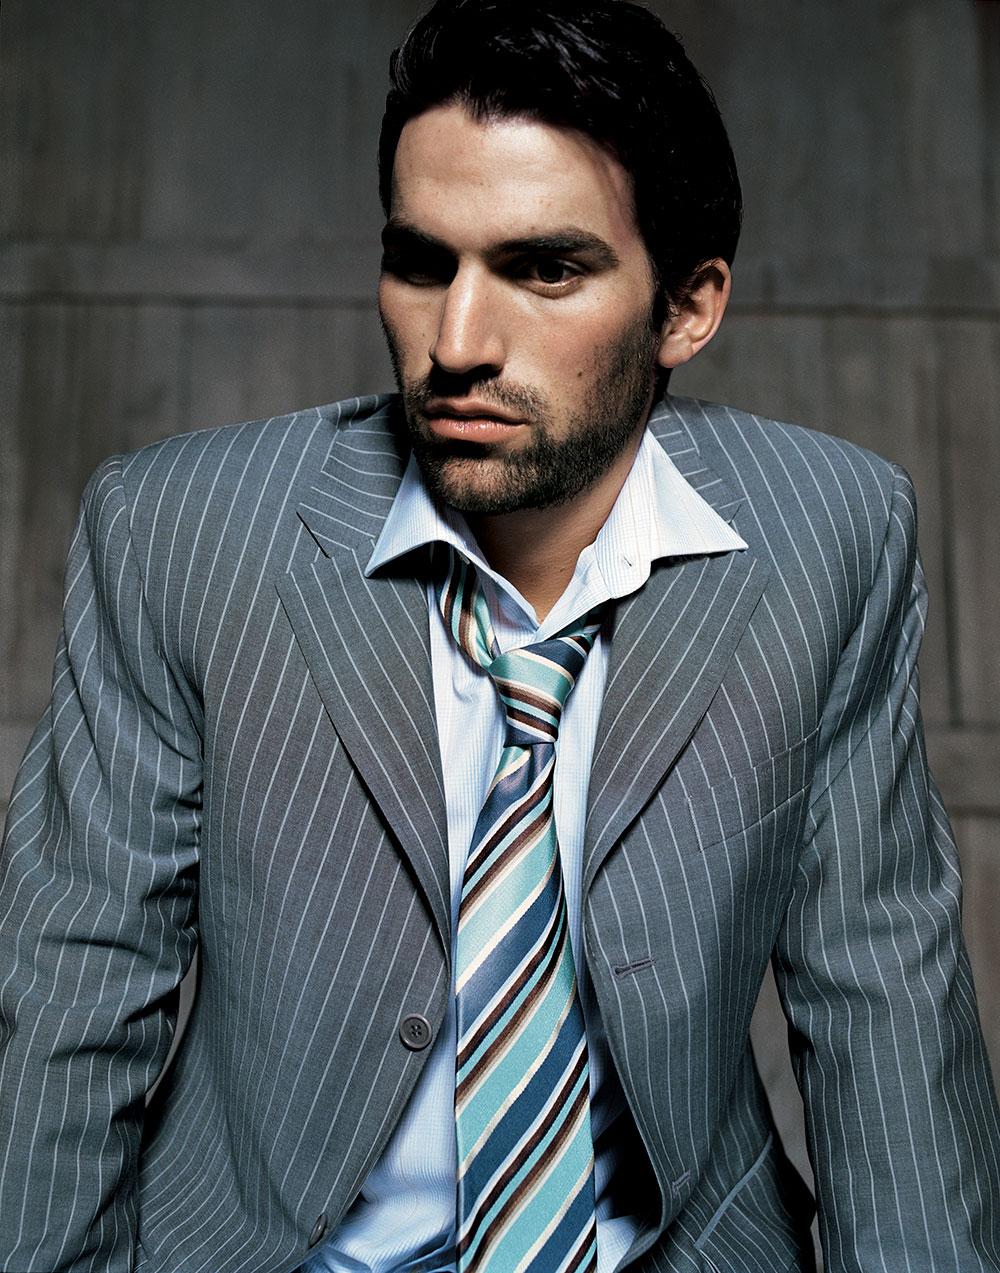 Men-Of-Fashion_45964_12AS.jpg